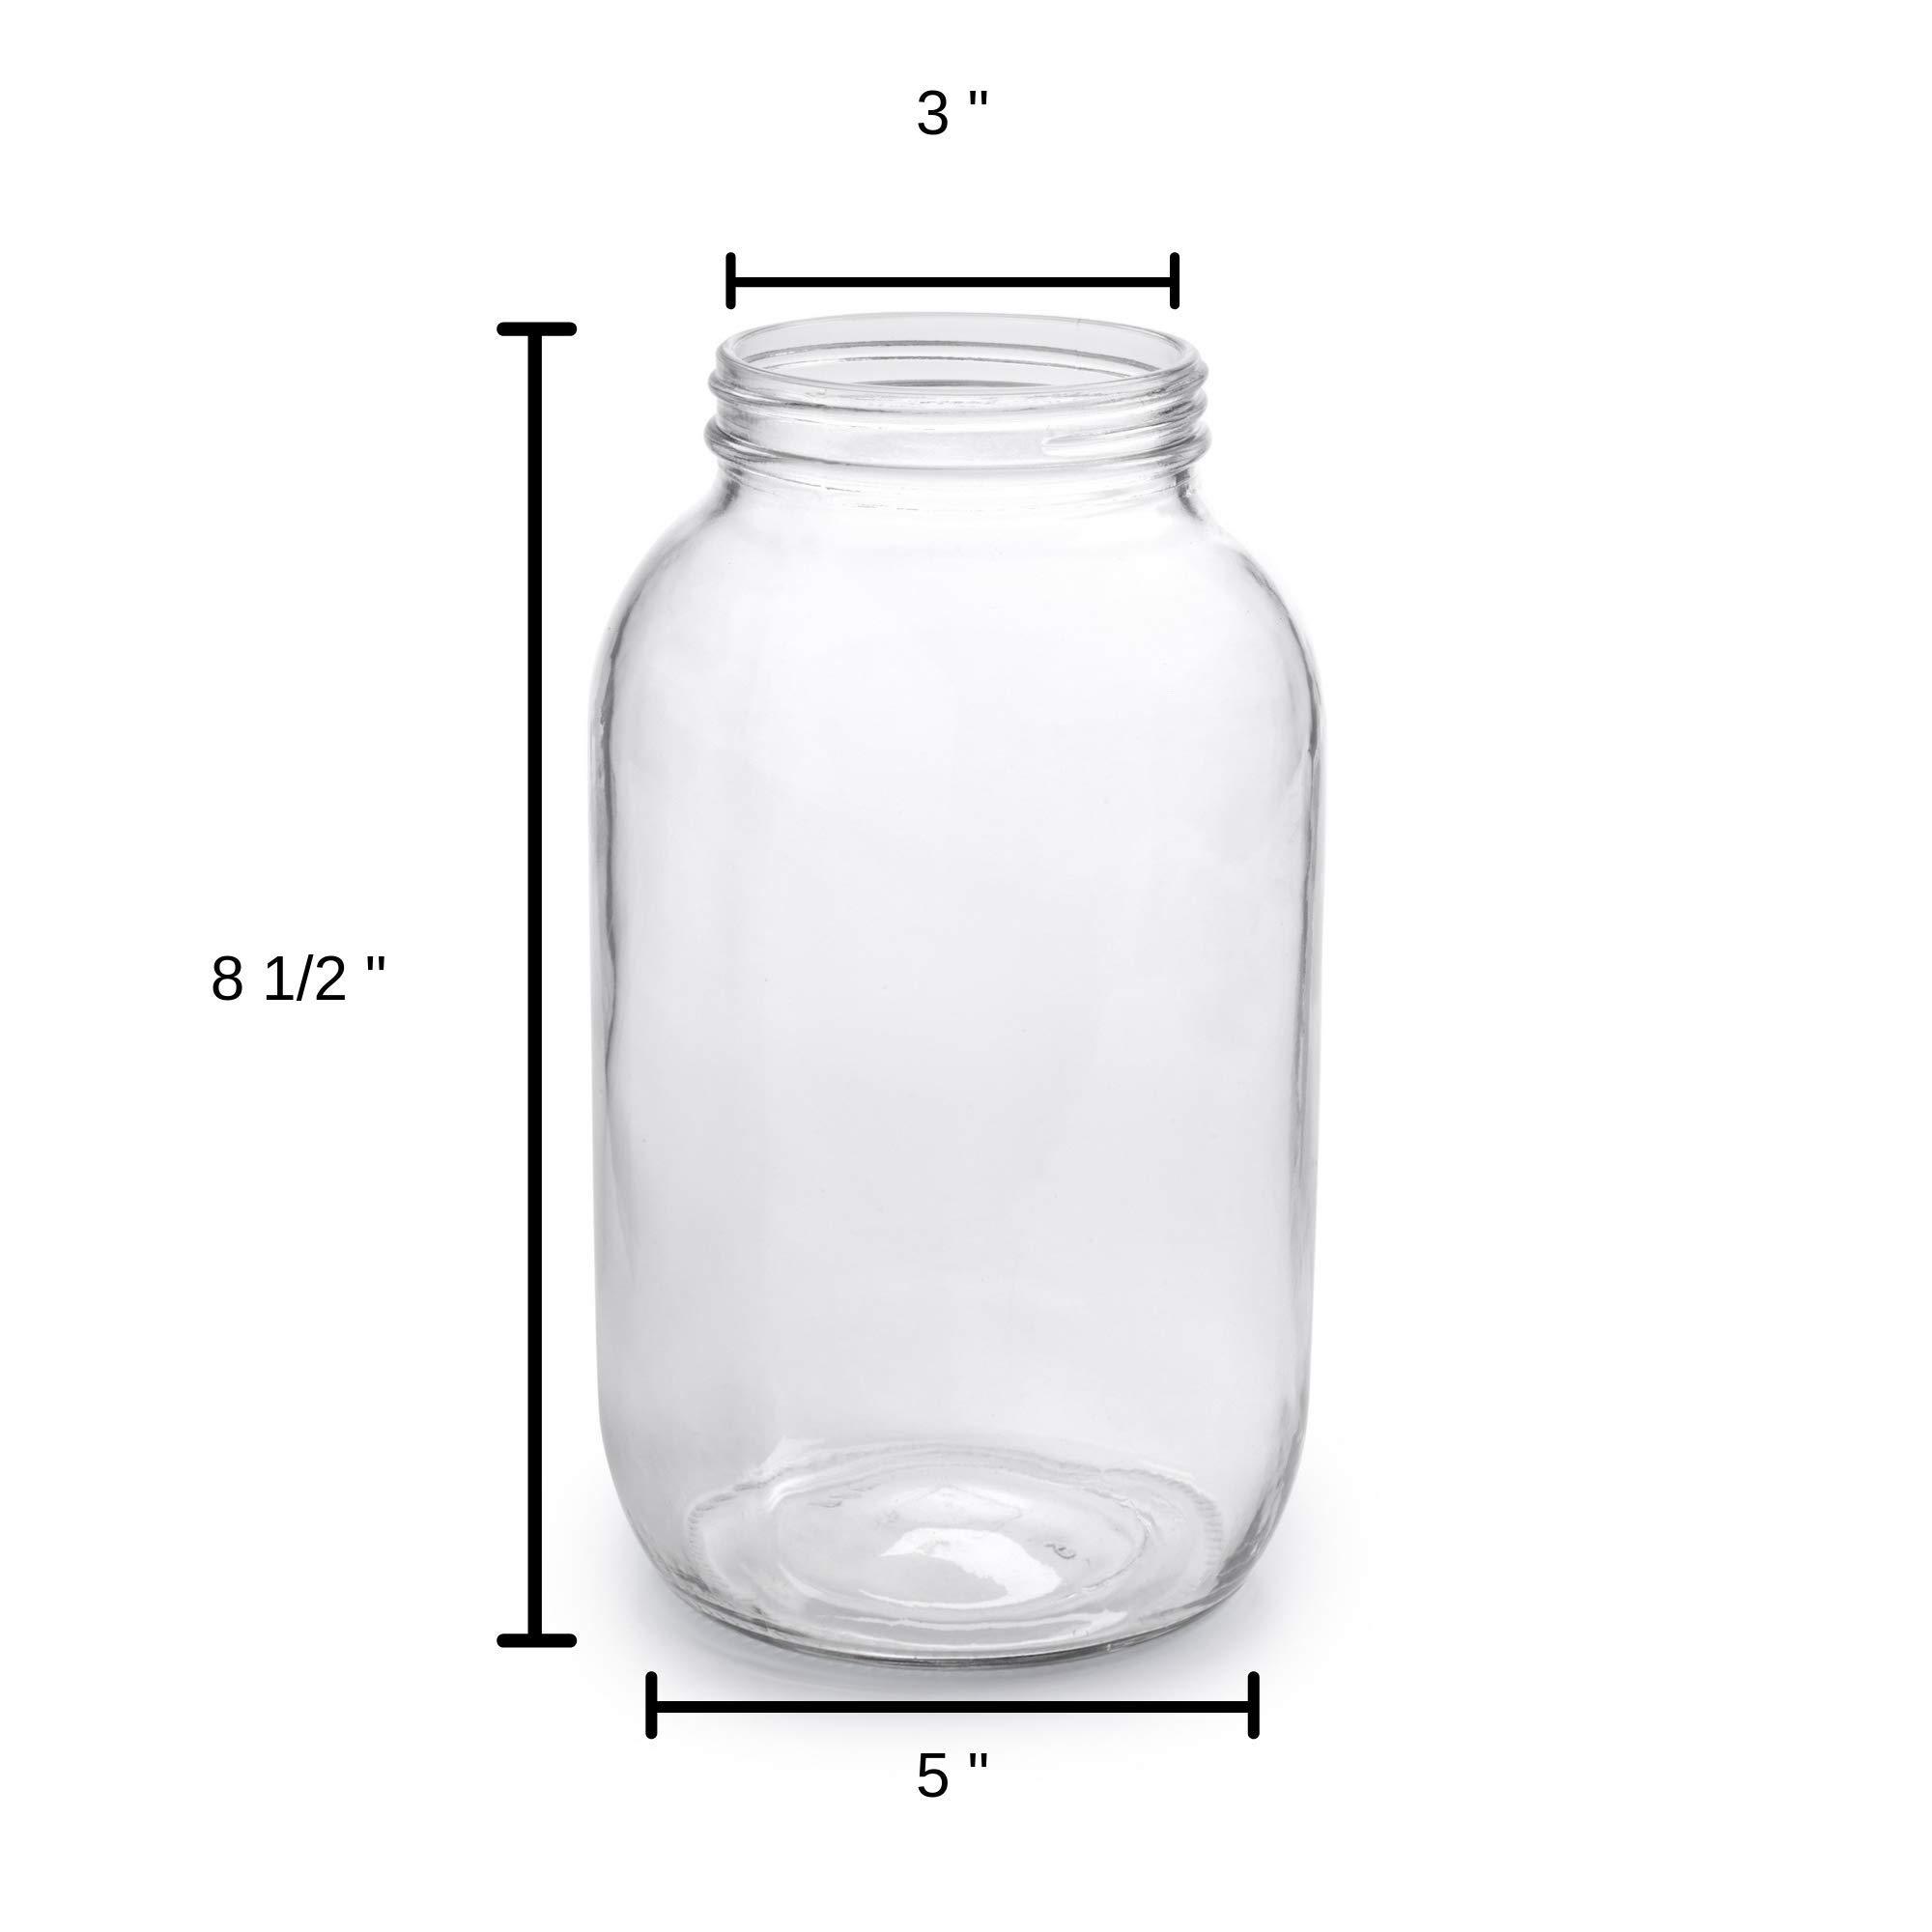 1790 Half Gallon Glass Jars (64oz) 2-Pack - Includes 2 Airtight Lids, Muslin Cloths, Rubber Bands - BPA Free, Dishwasher & Freezer Safe - Perfect for Kombucha, Kefir, Canning, Sun Tea, Fermentation by 1790 (Image #3)